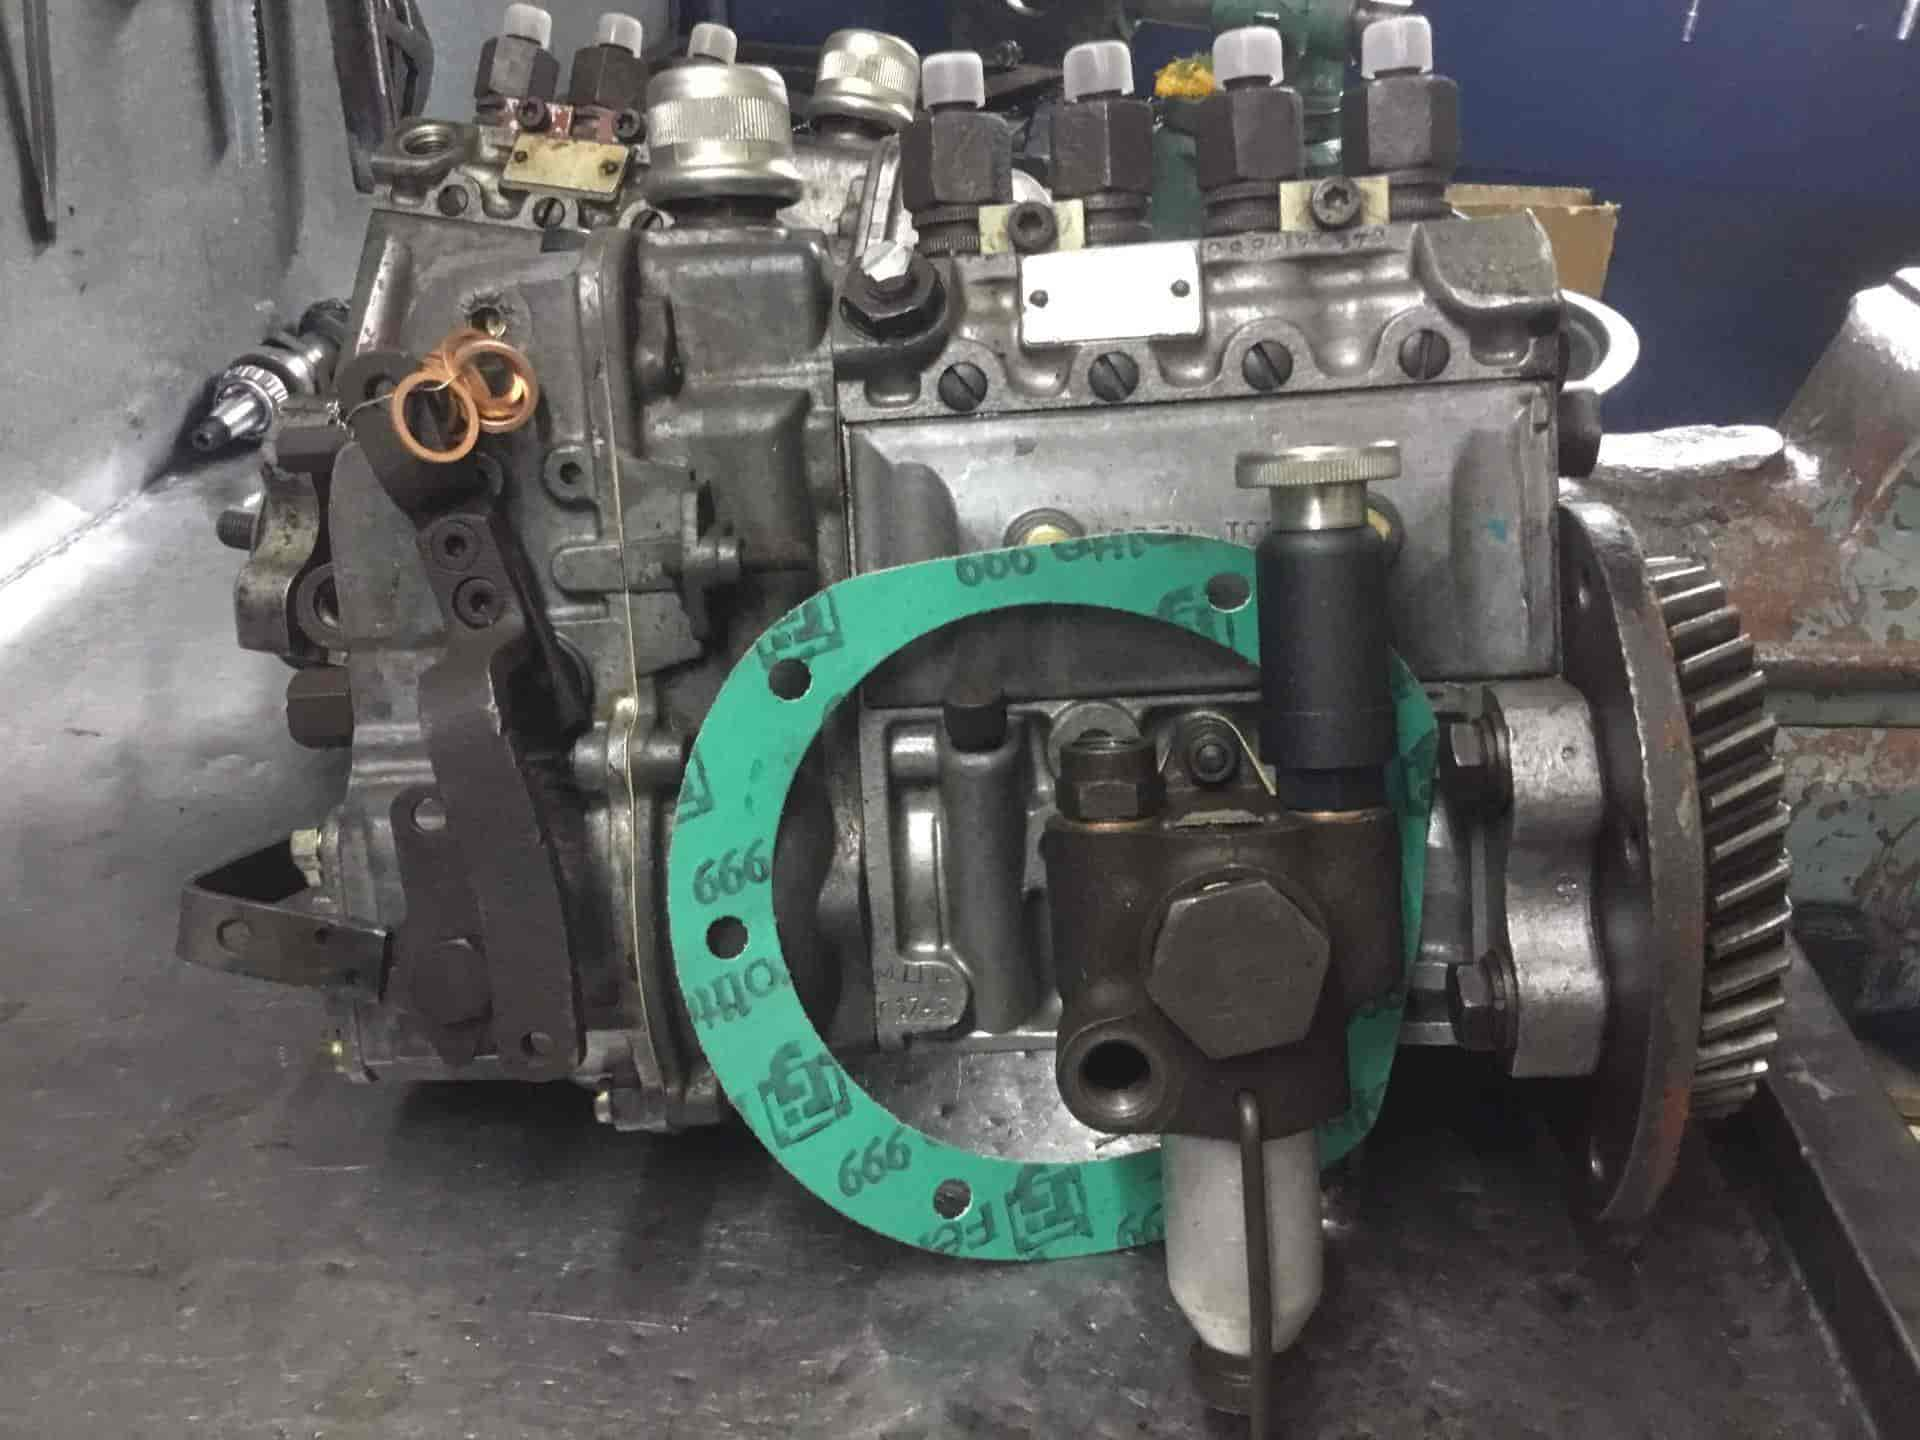 Mahalaxmi Diesel Pump Service, Timbdi Patiya - Diesel Pump